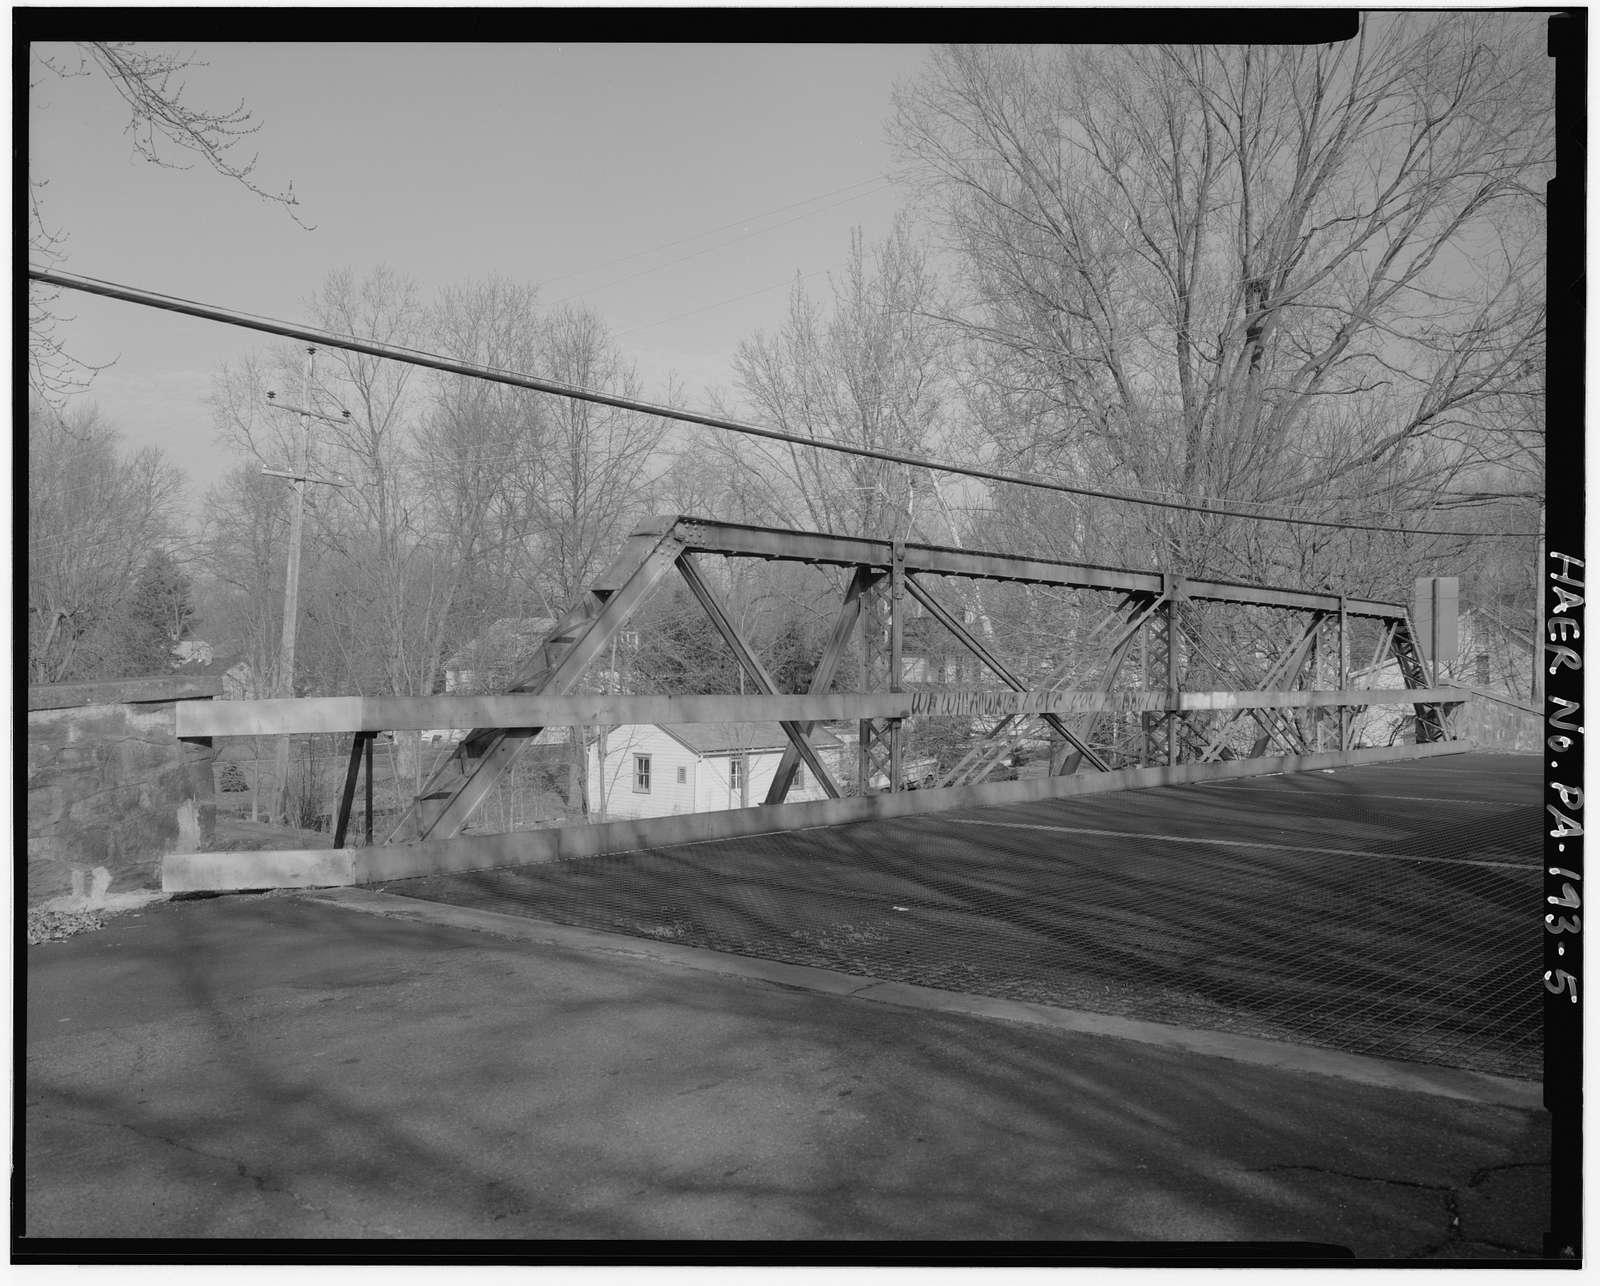 Bucks County Bridge No. 313, Spanning Delaware Canal at Letchworth Avenue, Yardley, Bucks County, PA